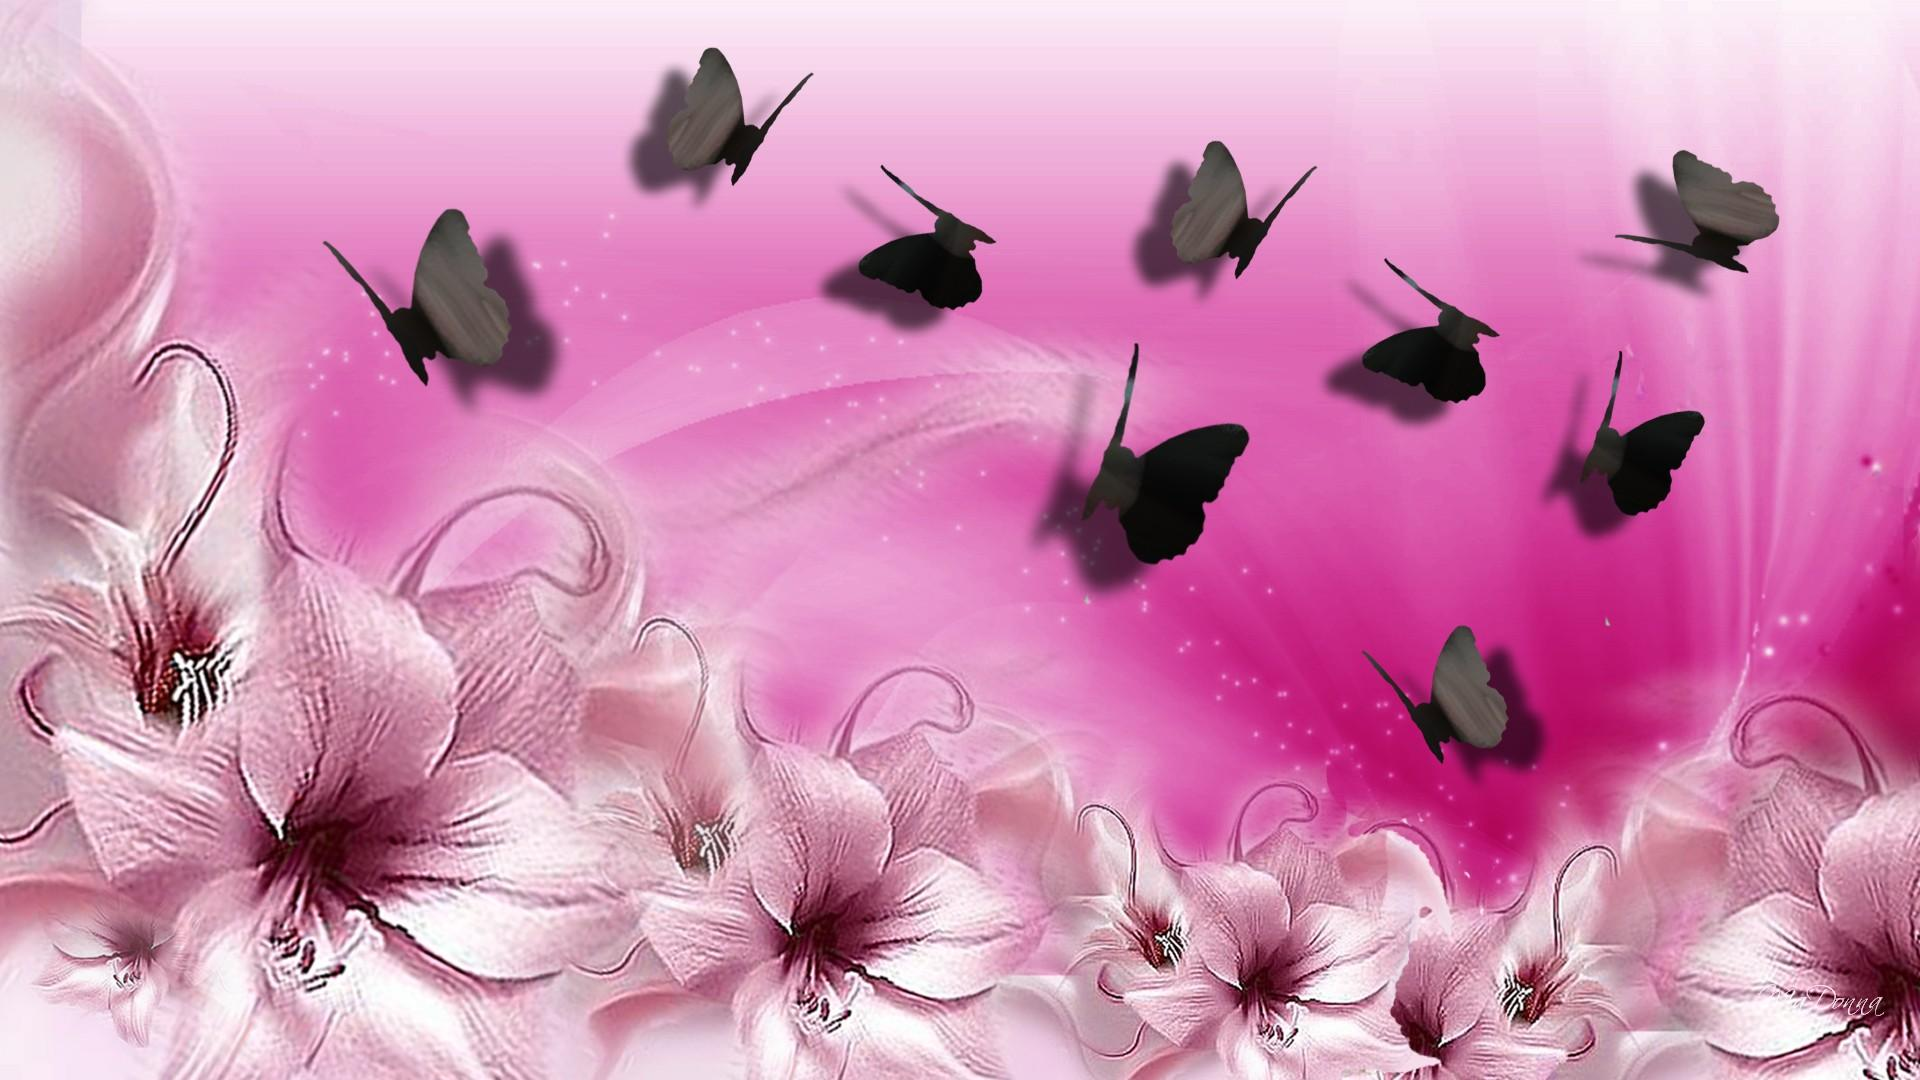 47+ Pink Butterfly Wallpaper Desktop on WallpaperSafari